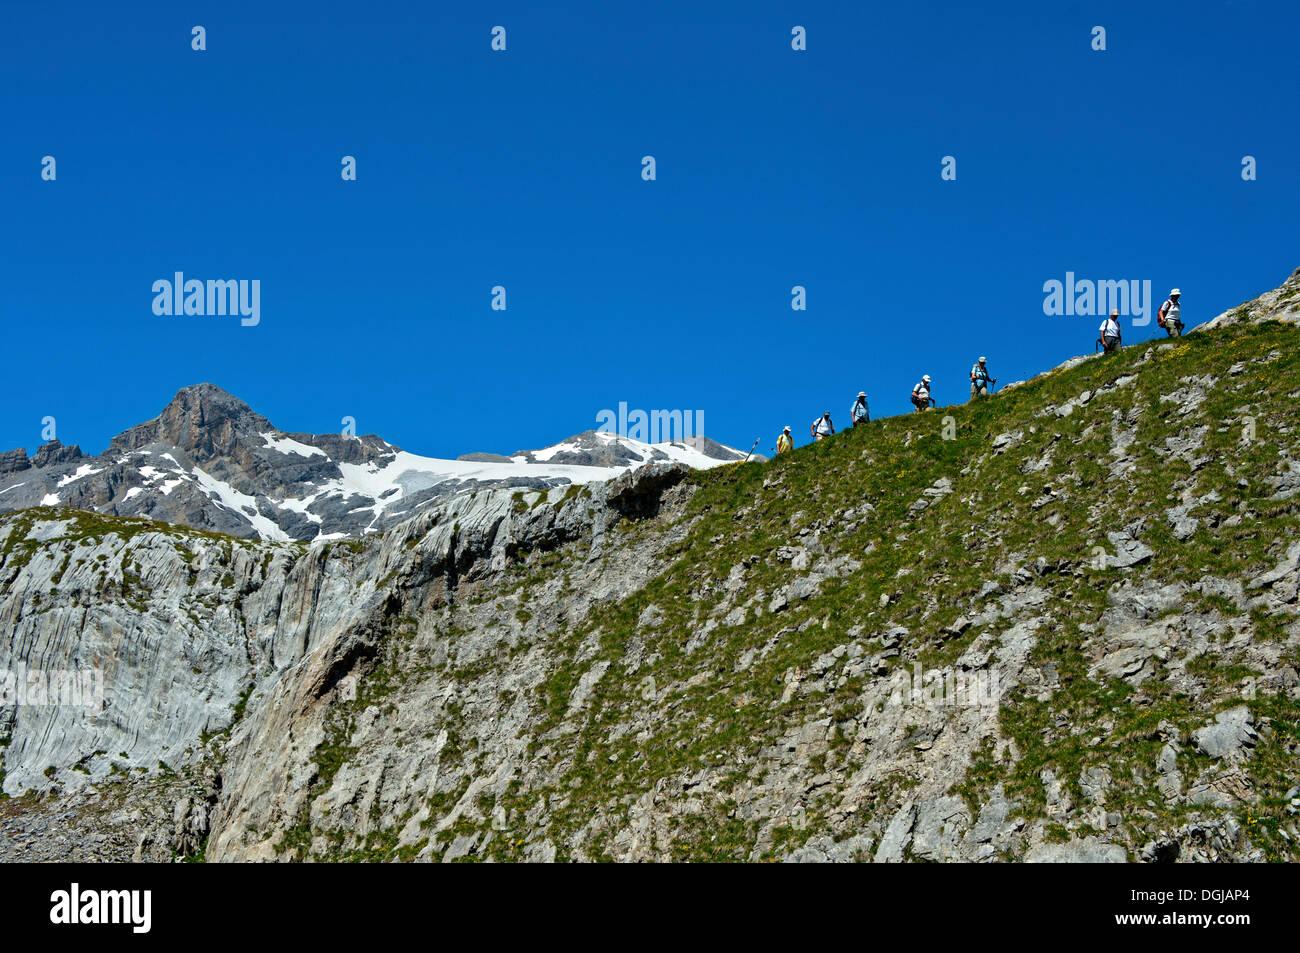 Wanderer unterhalb des Gipfels des Wildhorn Berg, Berner Alpen, Kanton Wallis, Schweiz Stockbild